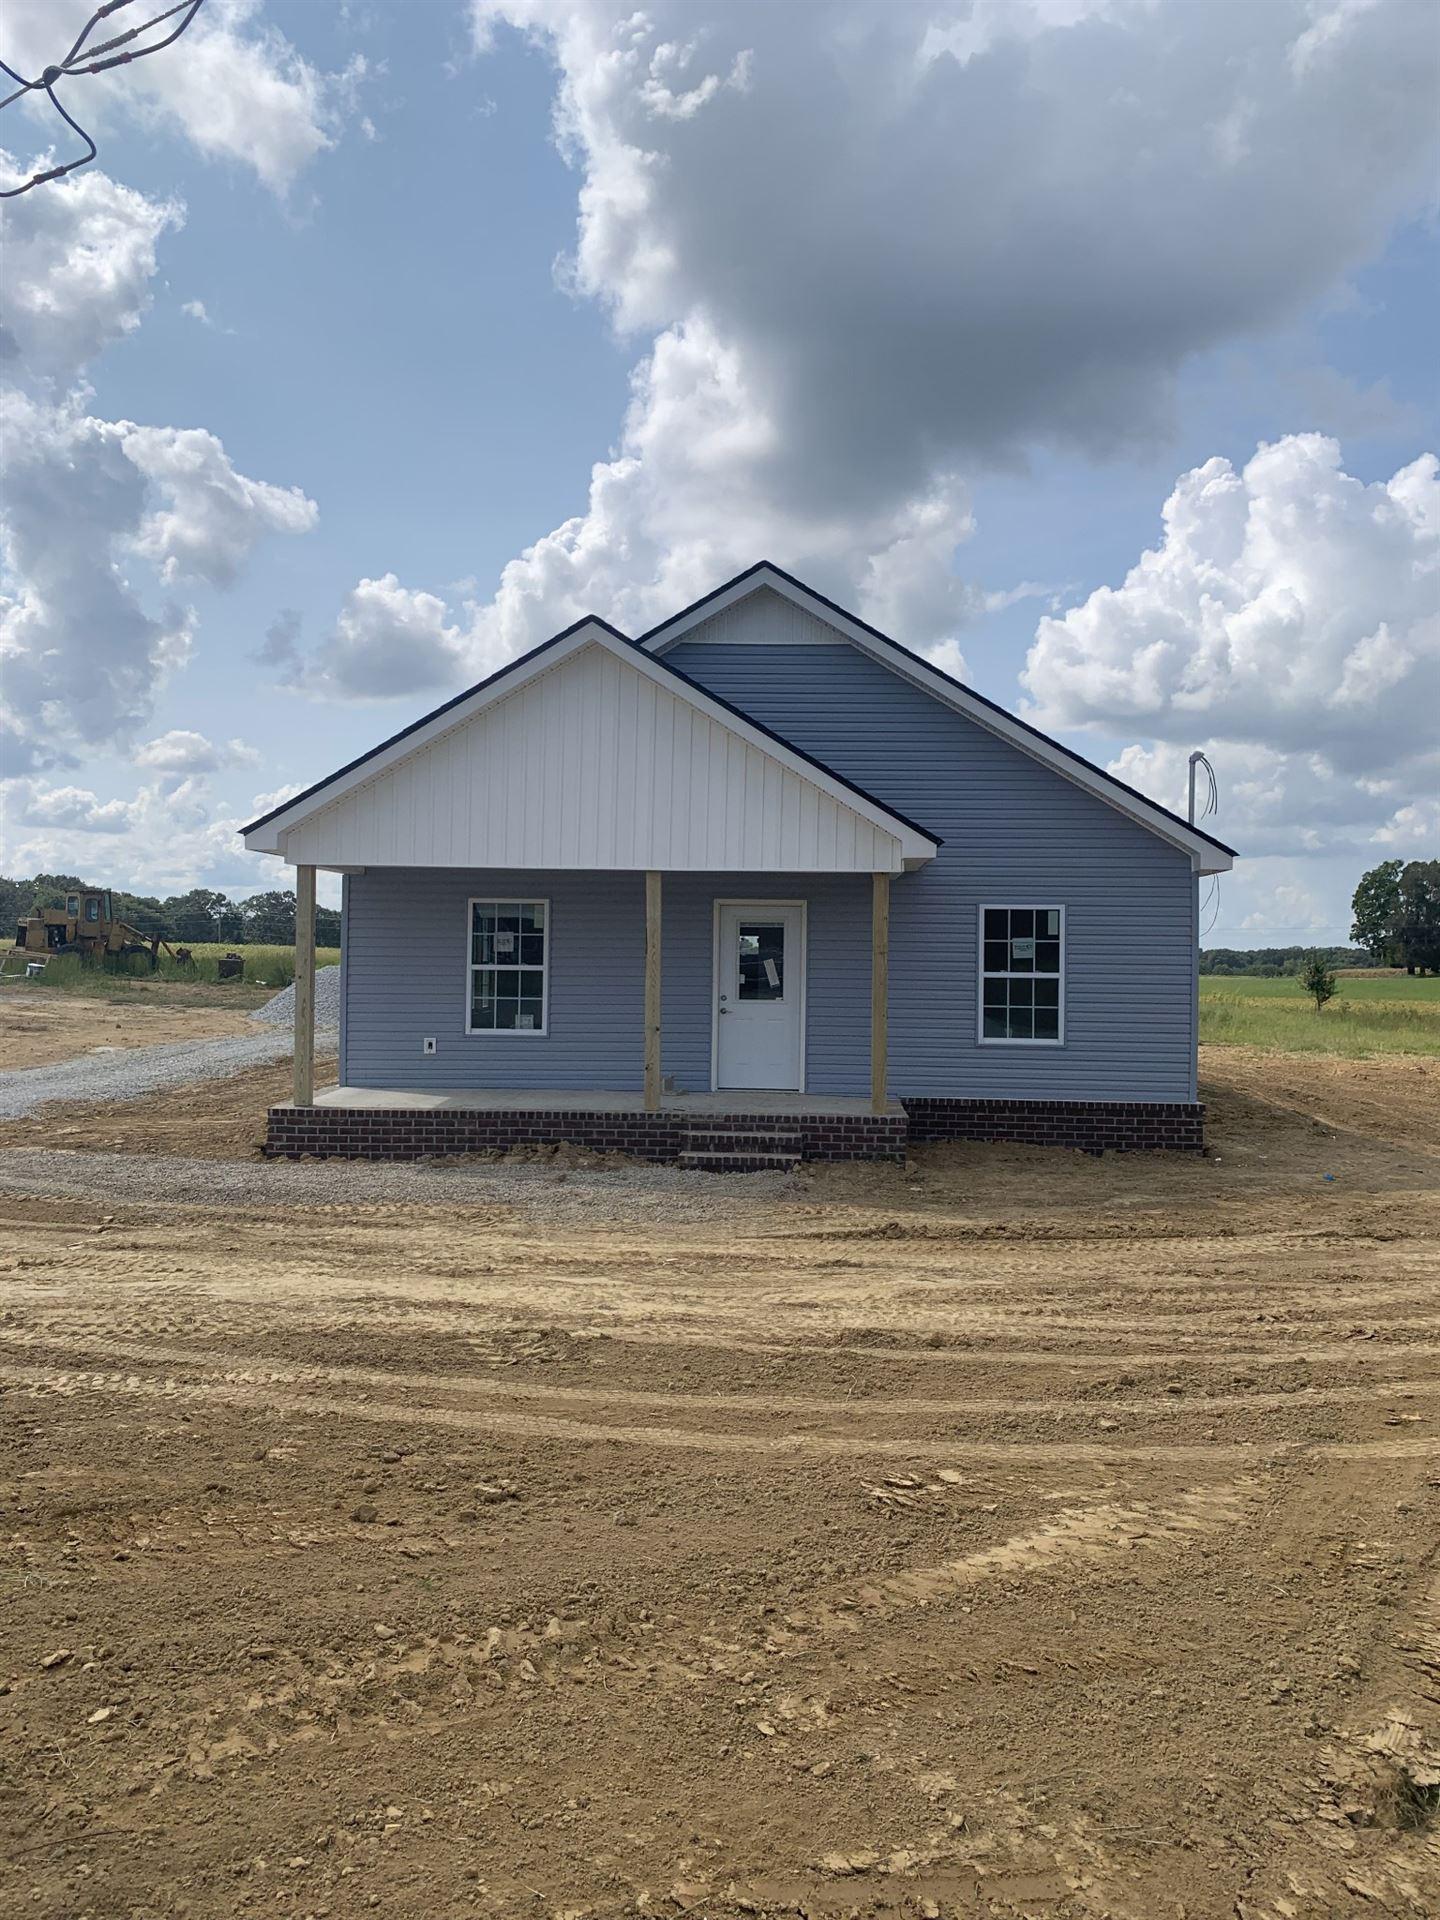 155 Carson Ln, Ethridge, TN 38456 - MLS#: 2291449